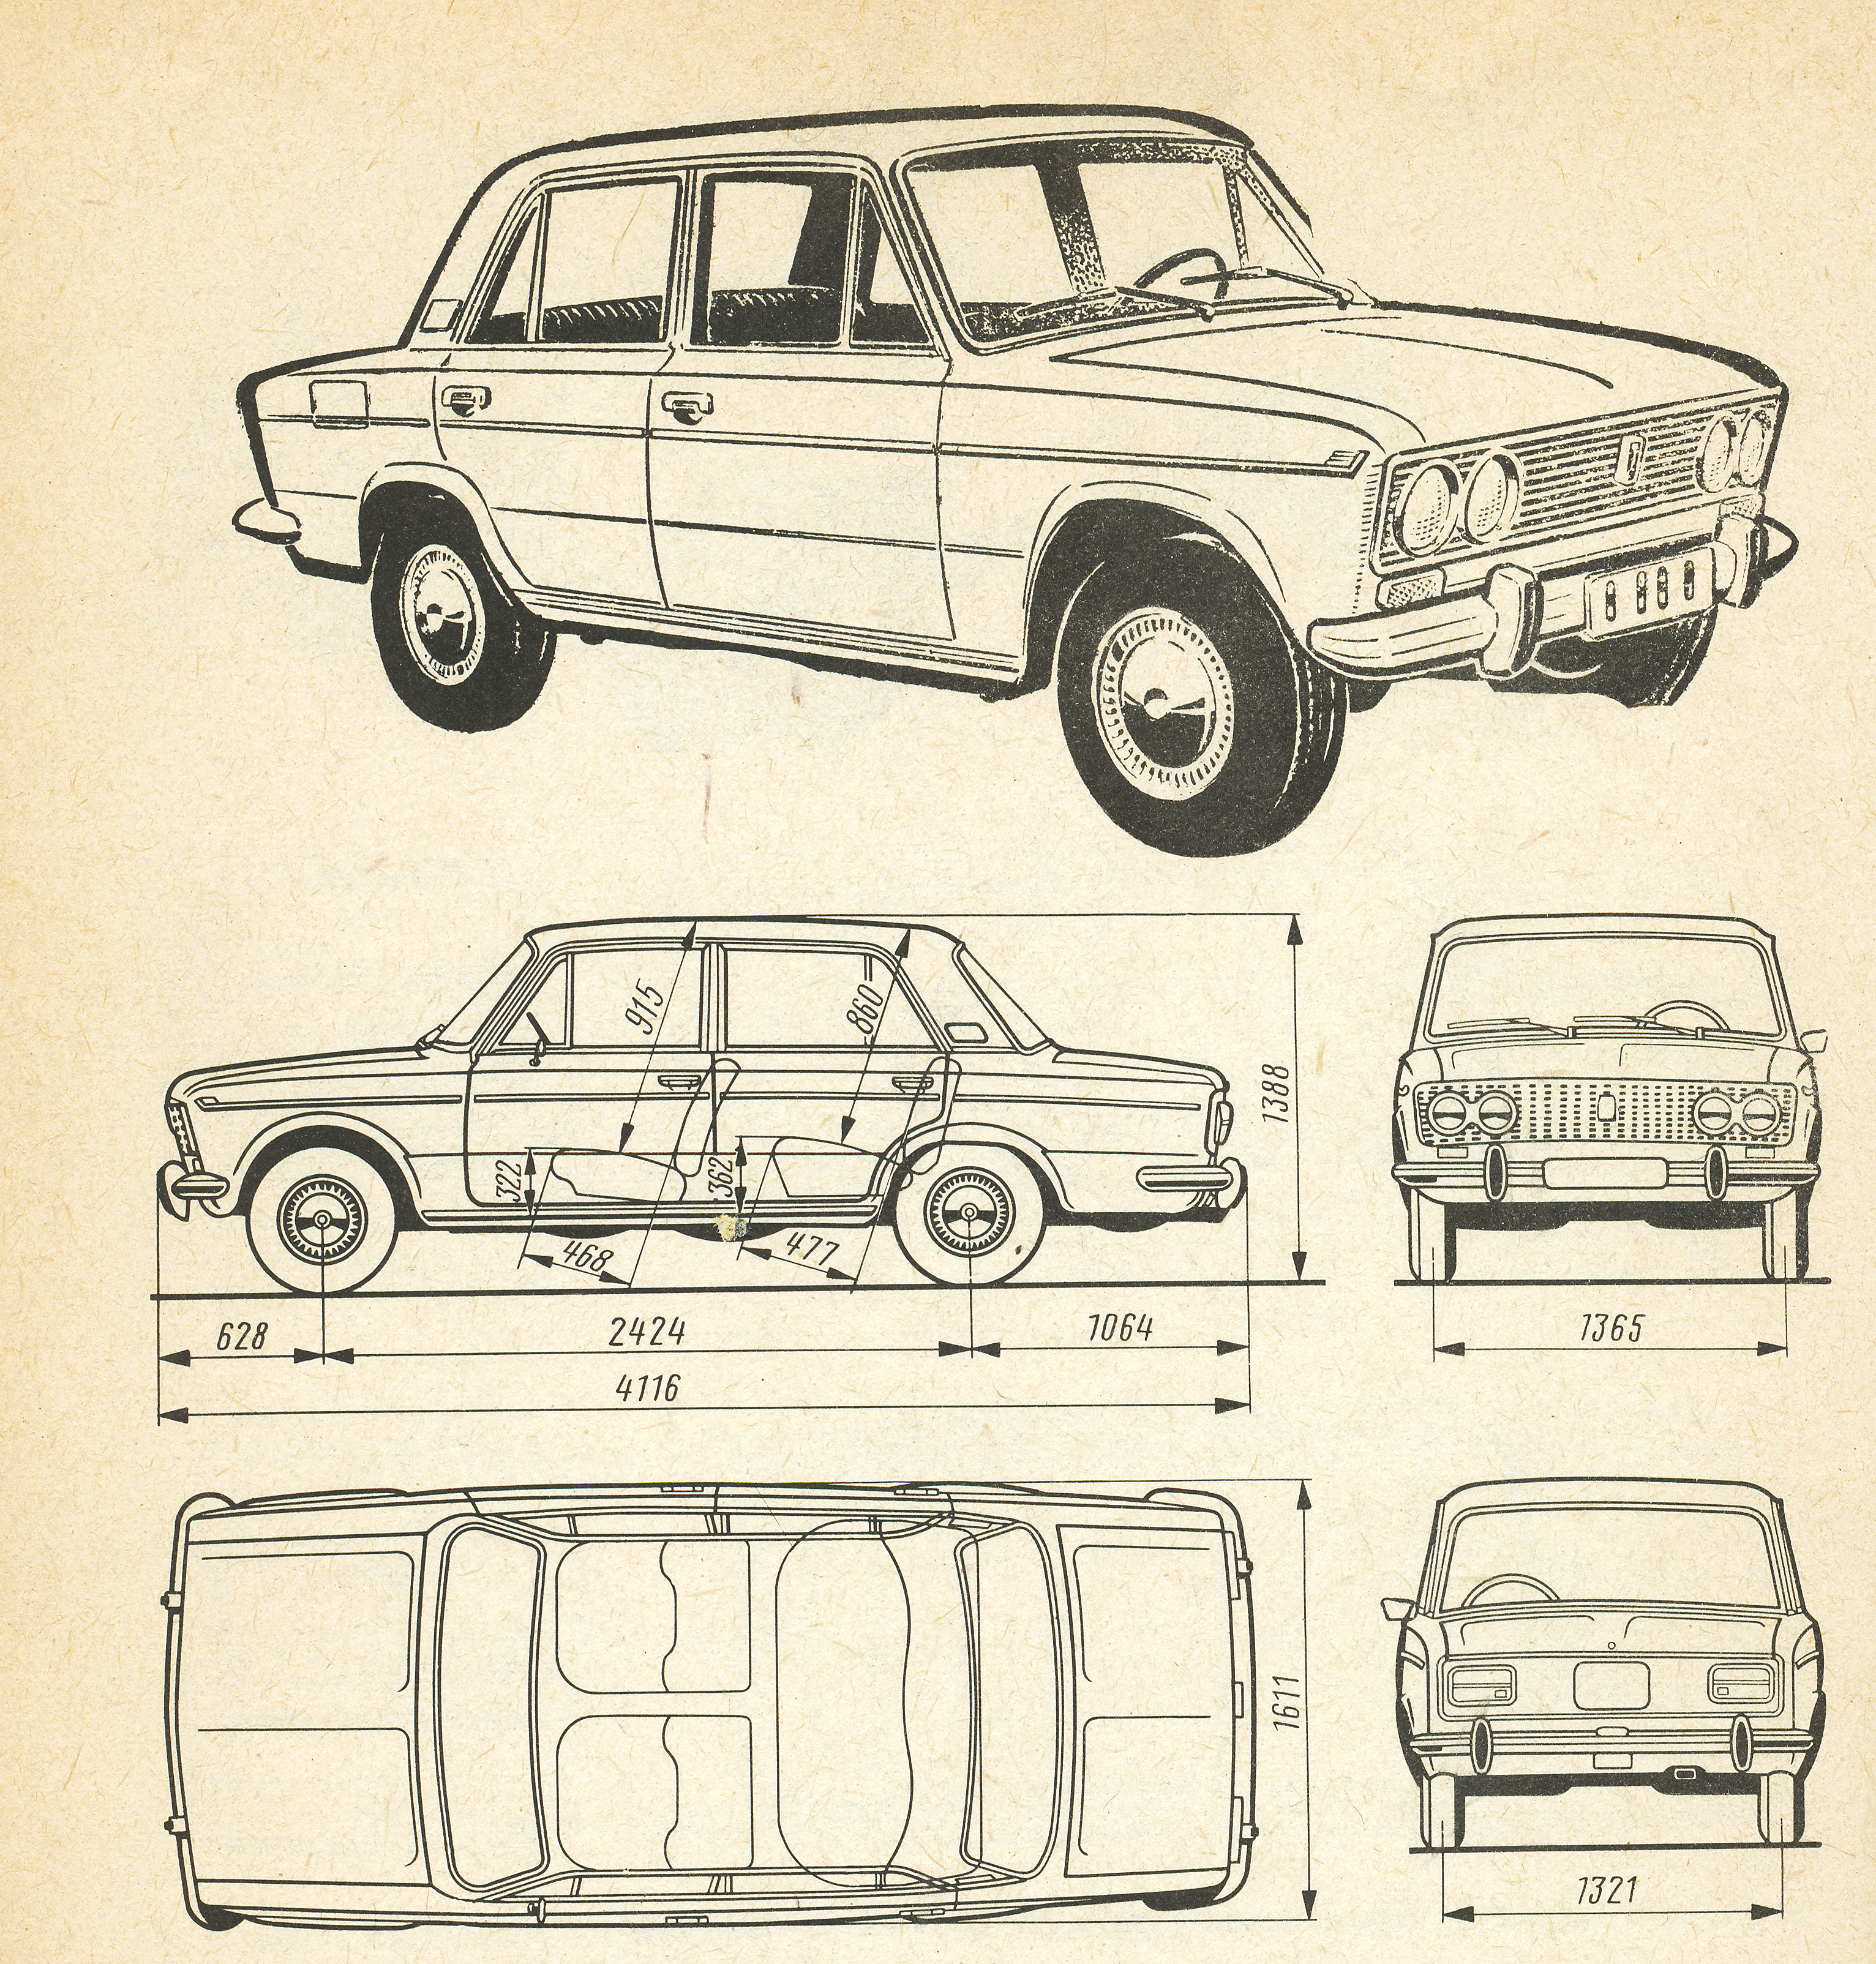 1_paper_texture_big_100902_.jpg (3064×3208) | Vehicles | Pinterest ...